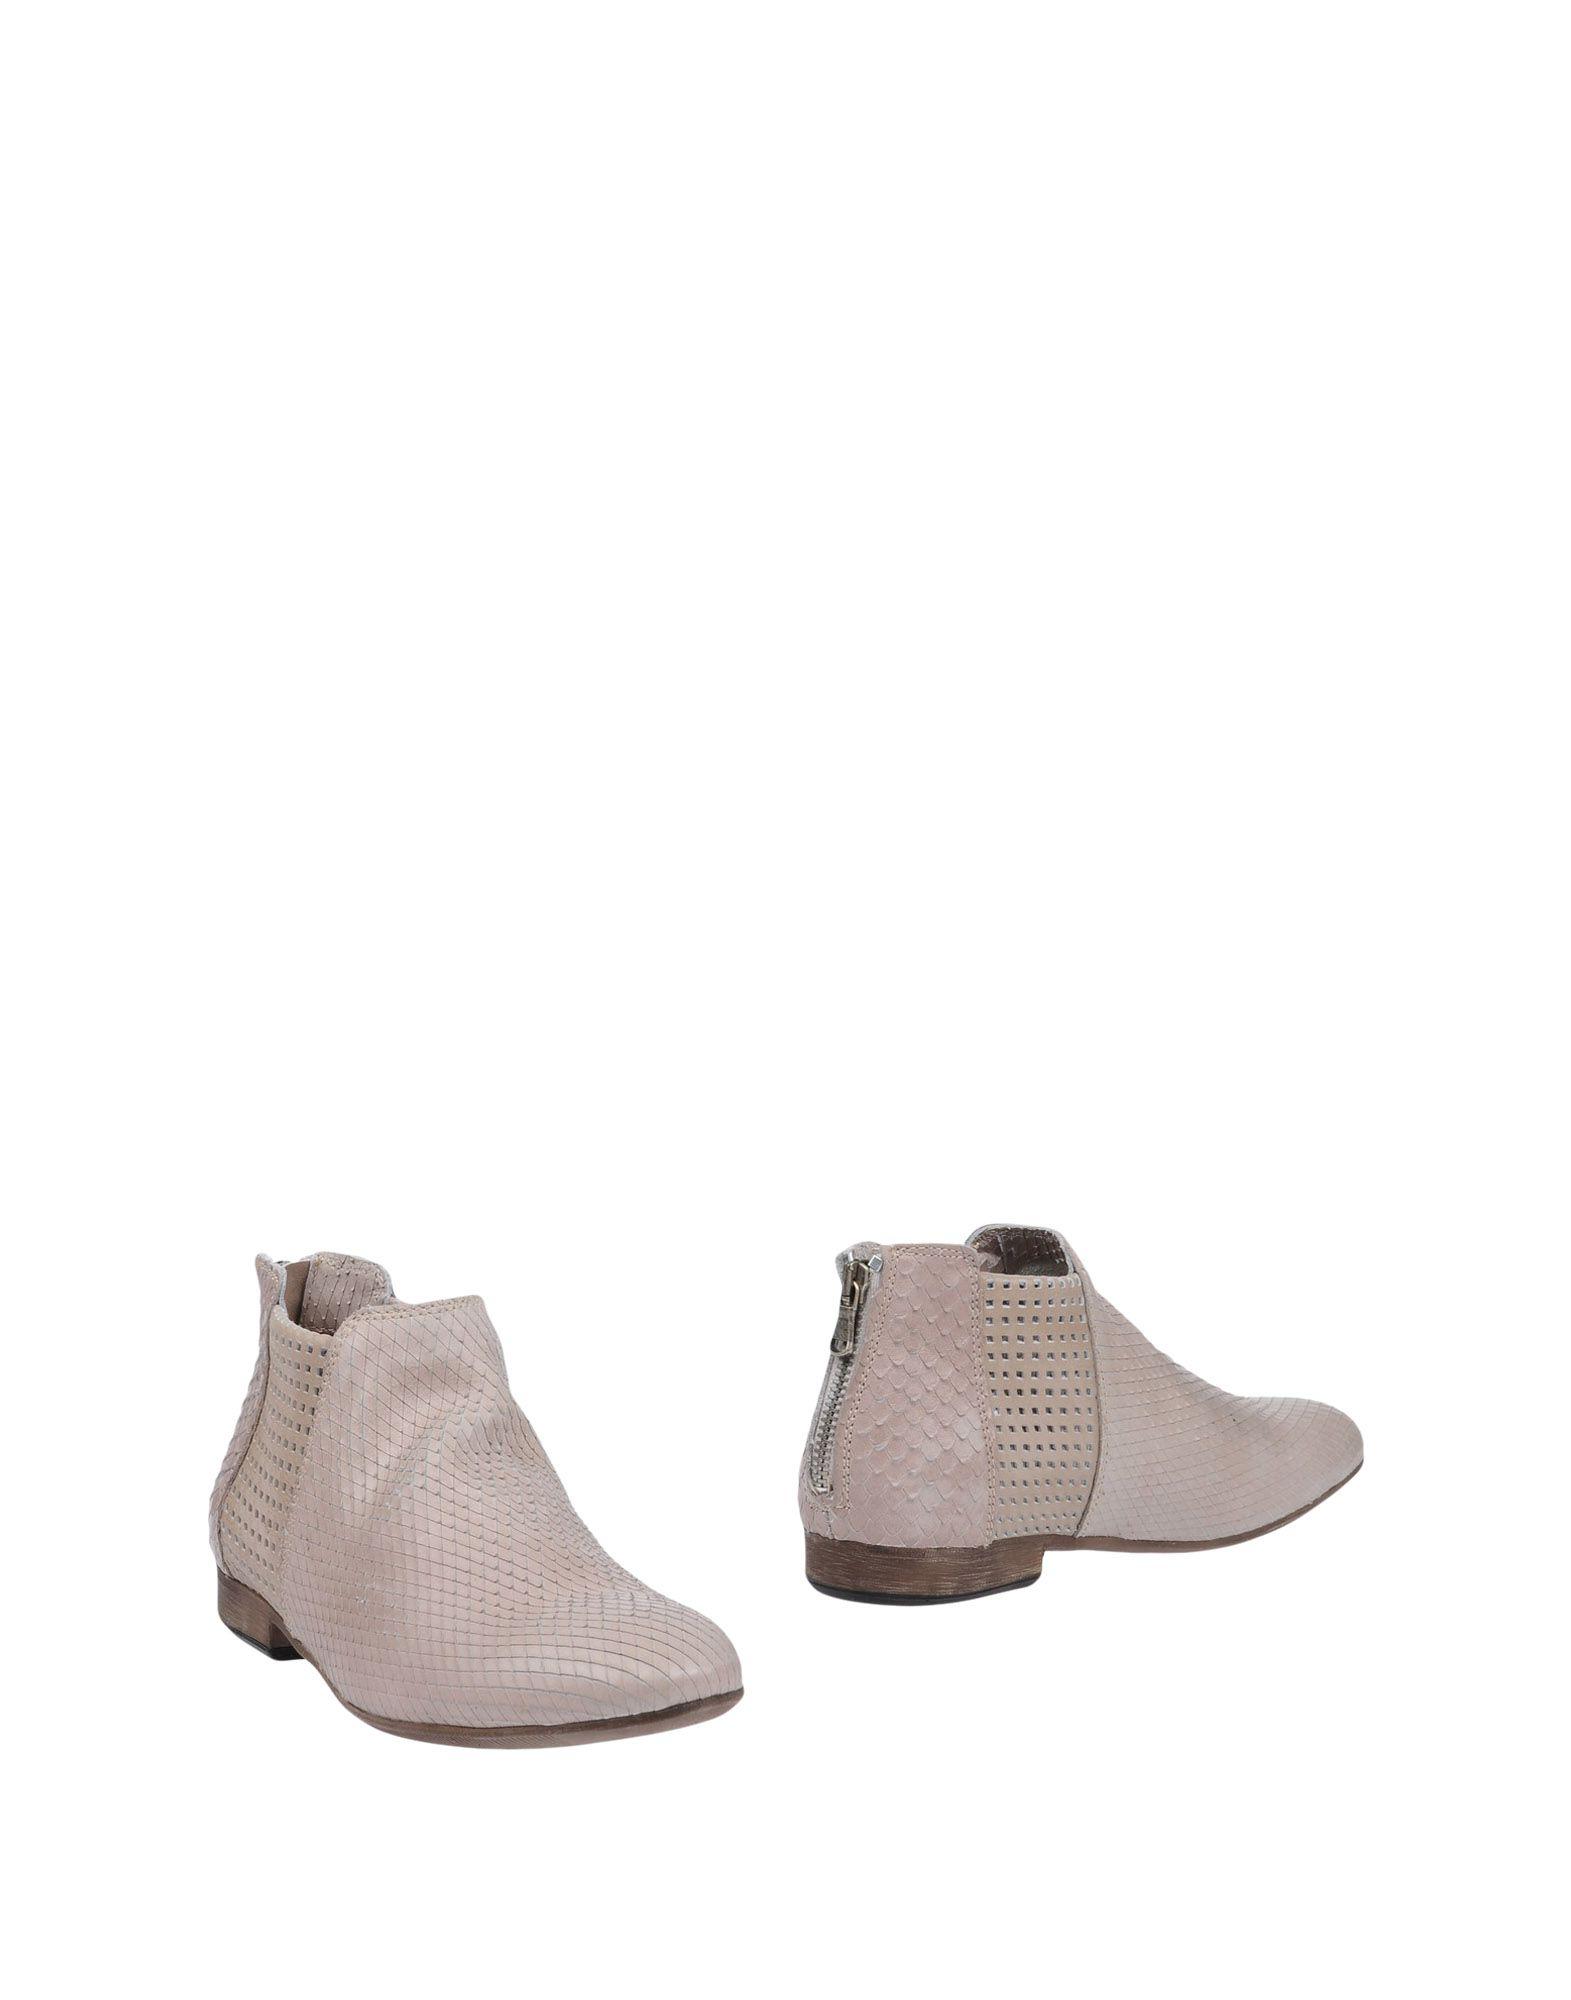 Cafènoir Ankle Boot - Women Cafènoir Ankle Boots online on   on Canada - 11143333SC 1a2d16